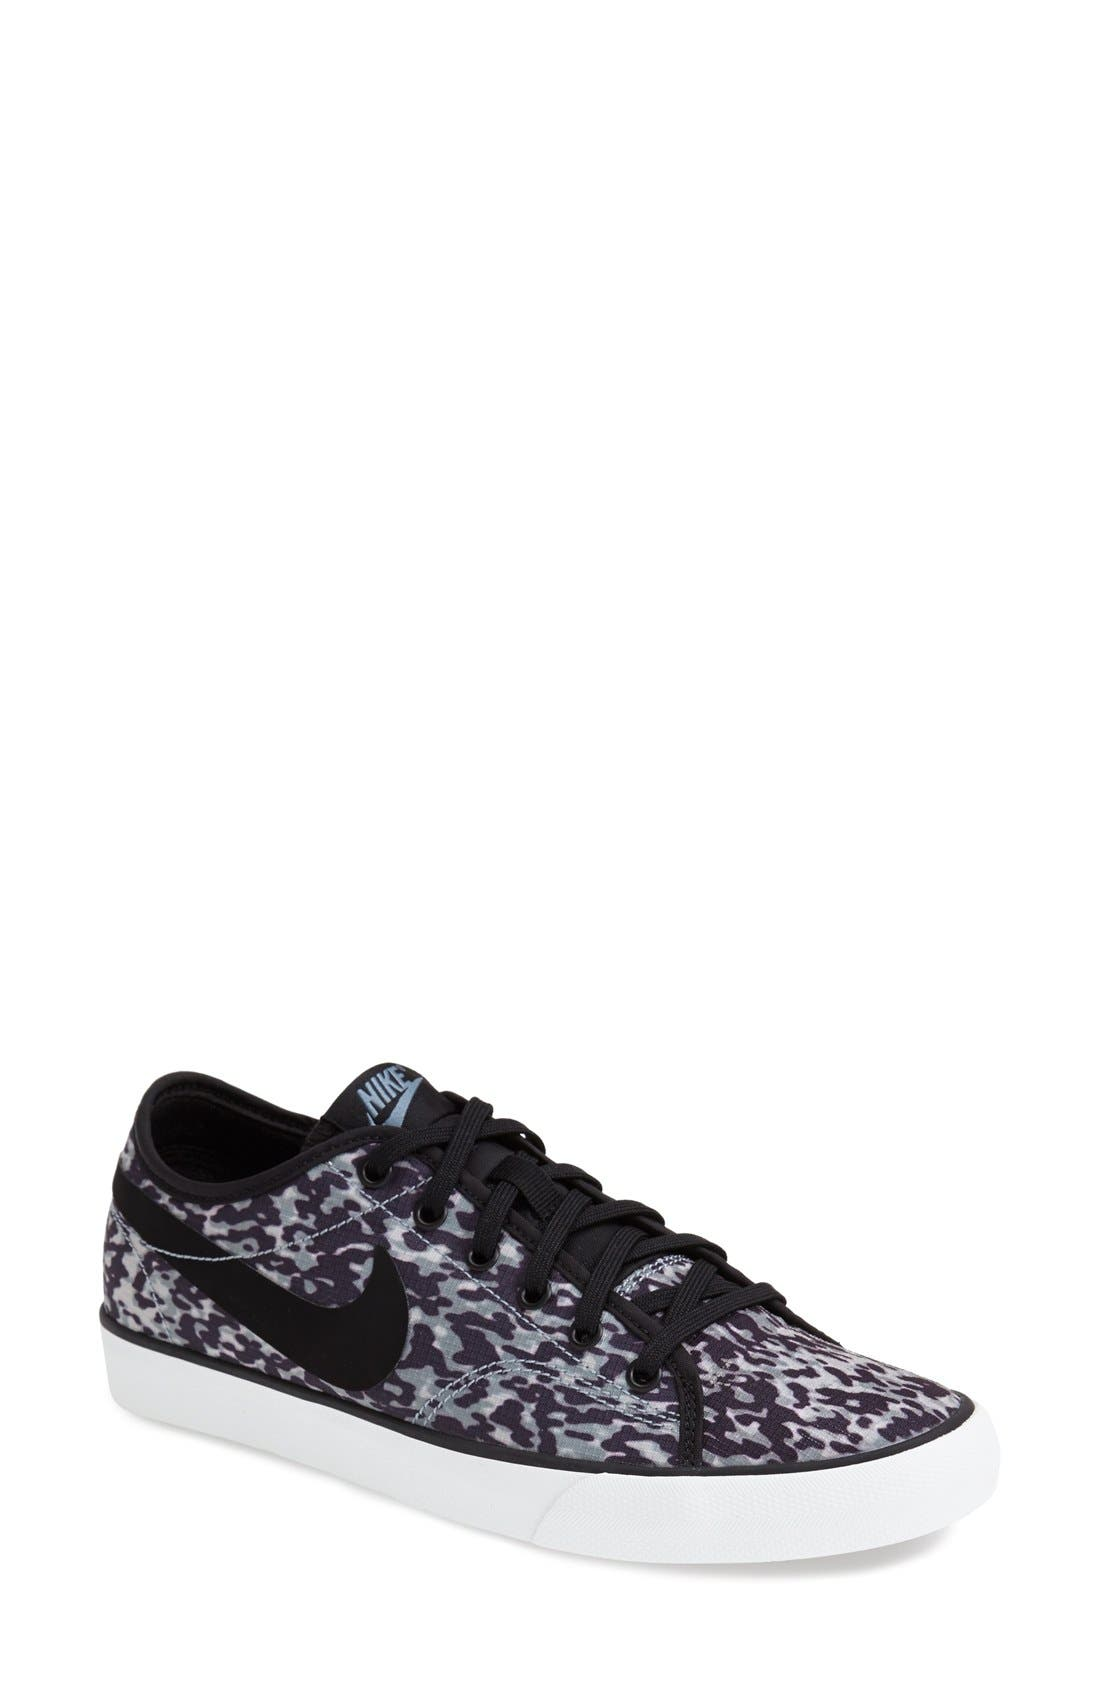 Main Image - Nike 'Primo - Court' Printed Canvas Sneaker (Women)